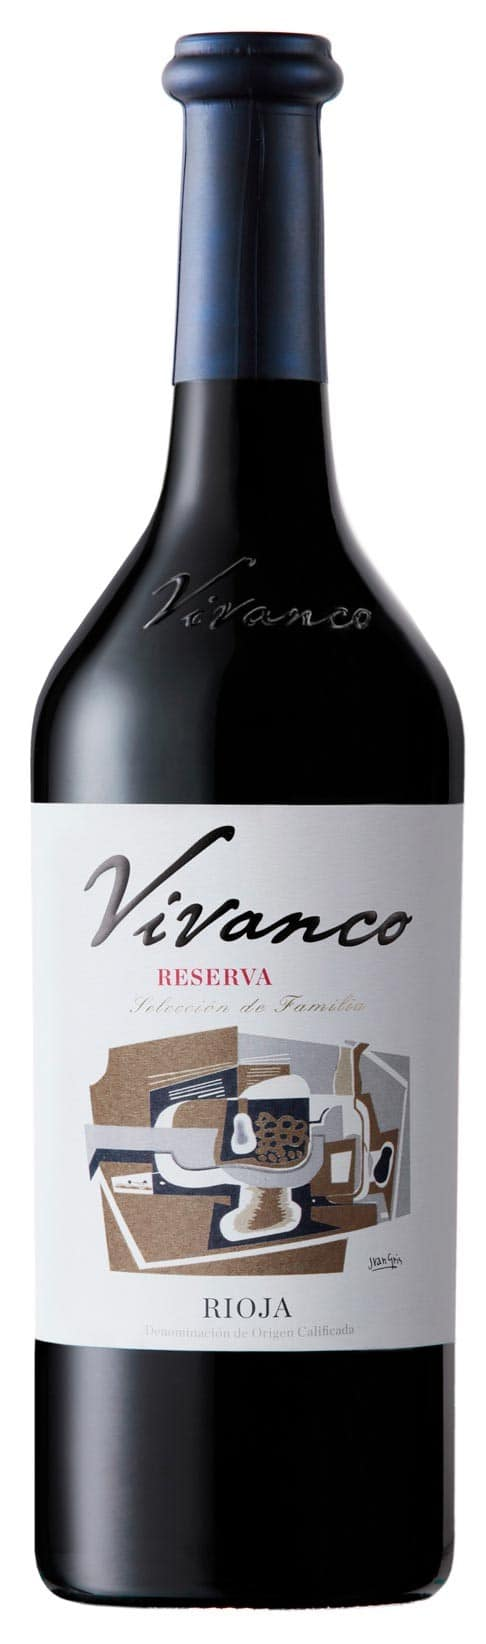 DINASTIA VIVANCO RESERVA 2010